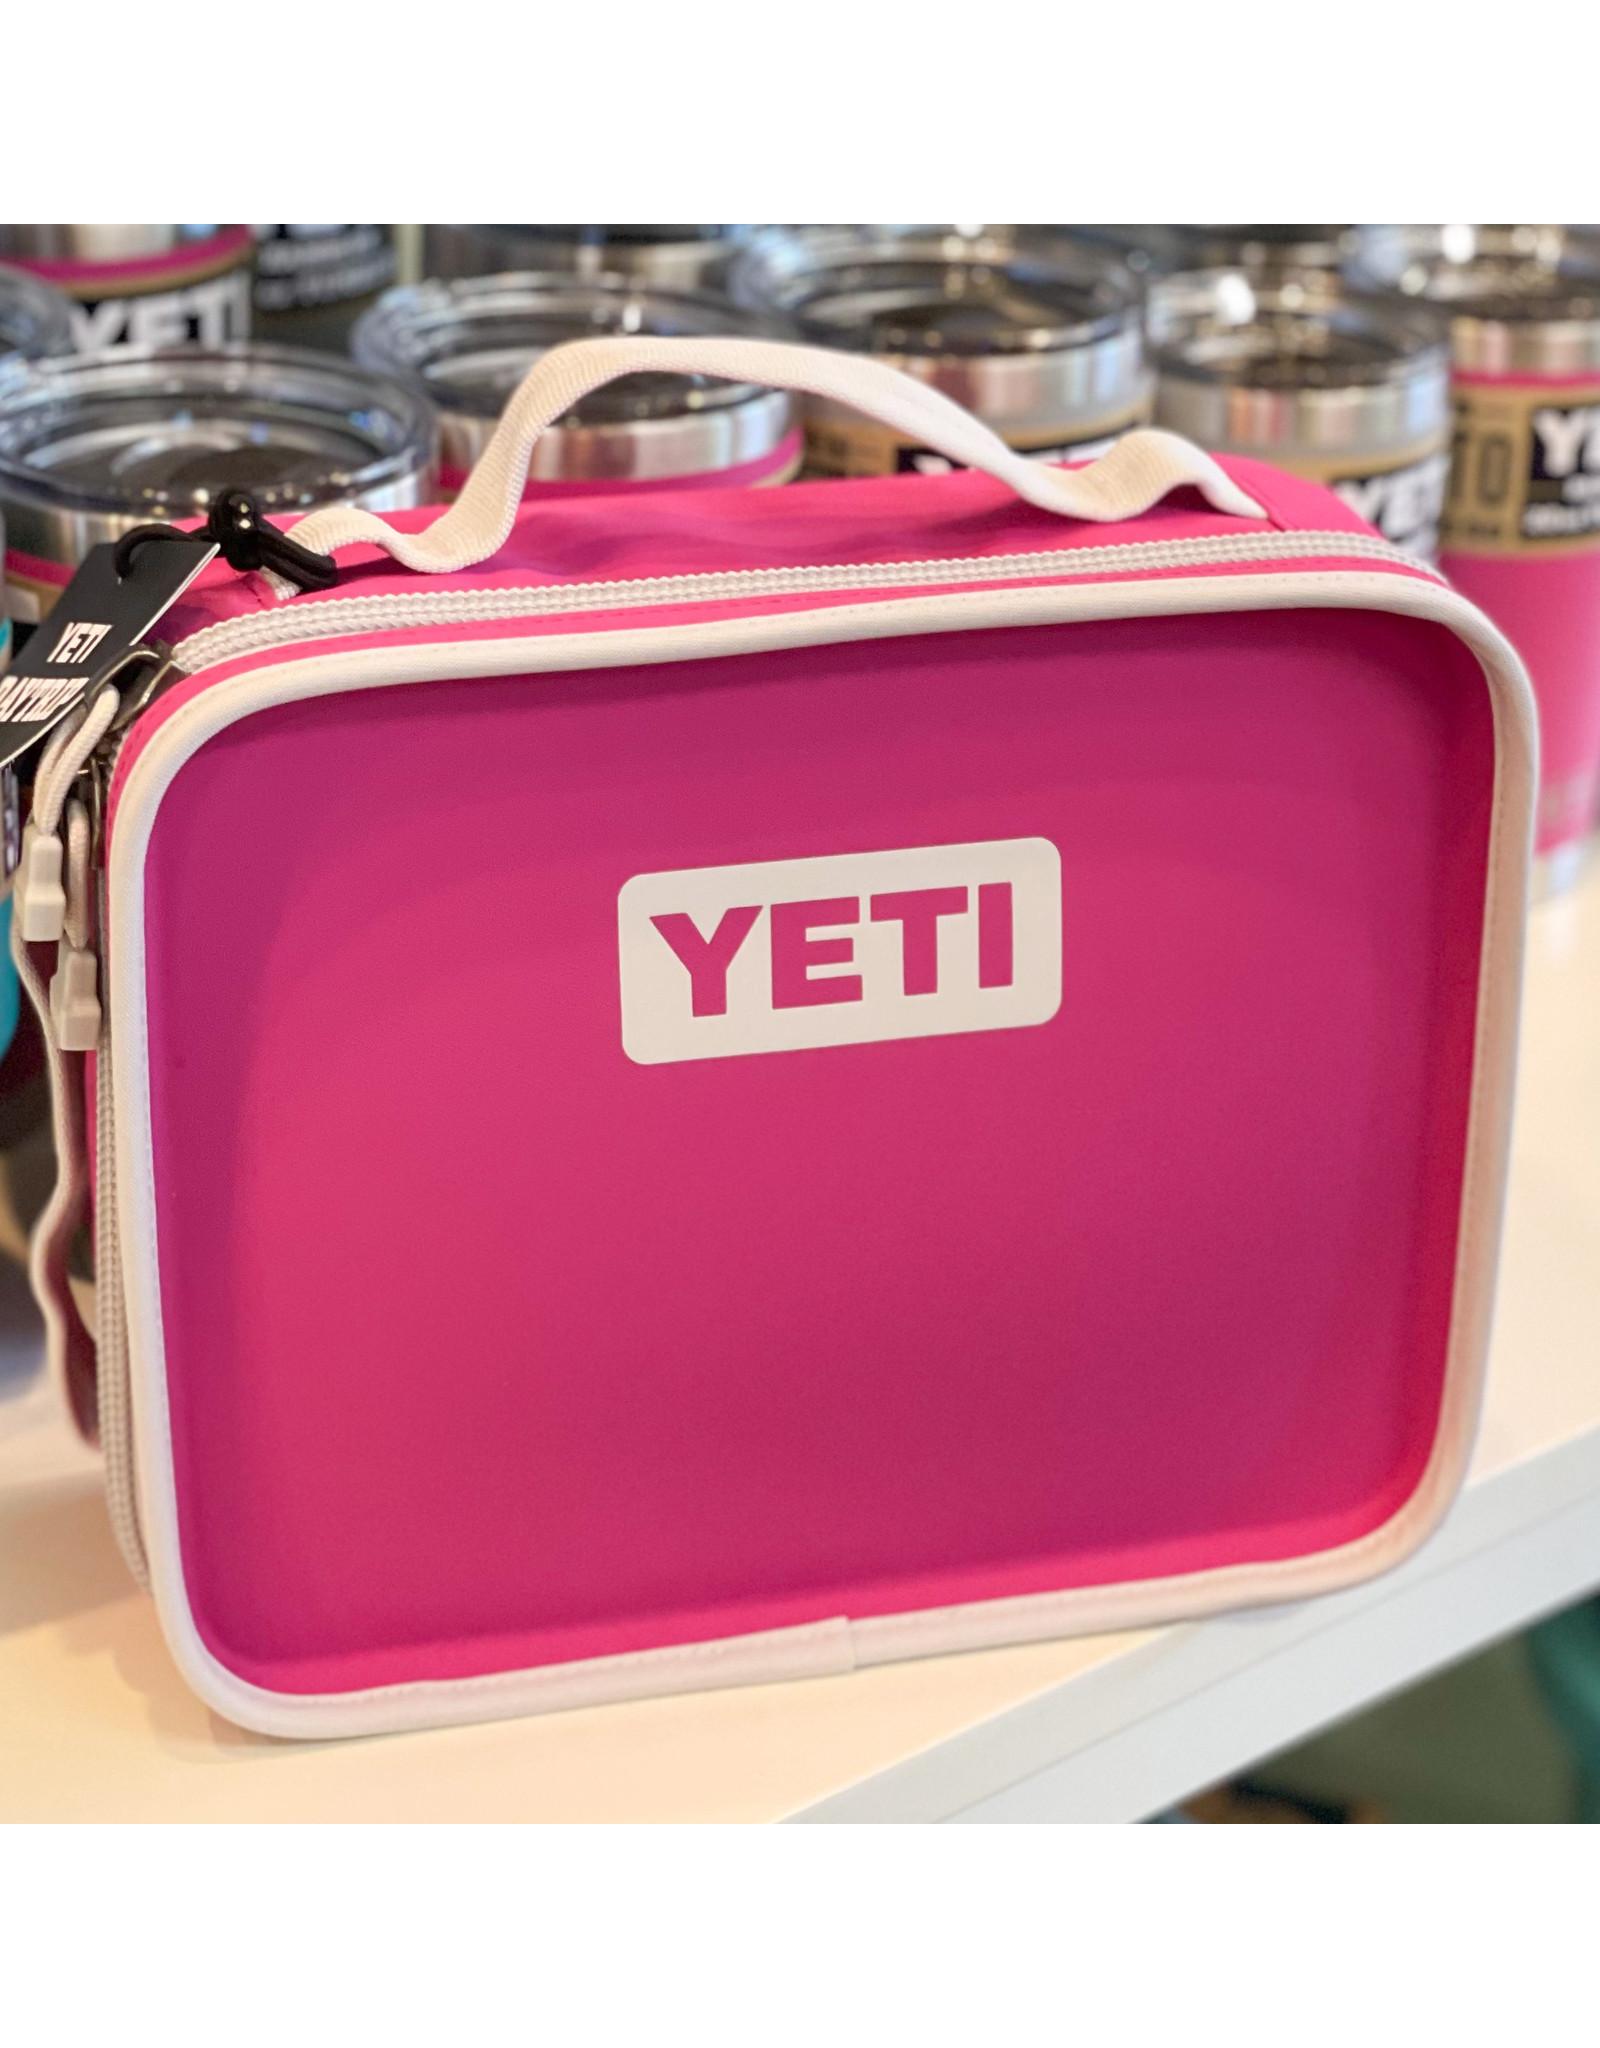 Yeti Daytrip Lunch Box Prickly Pear Pink